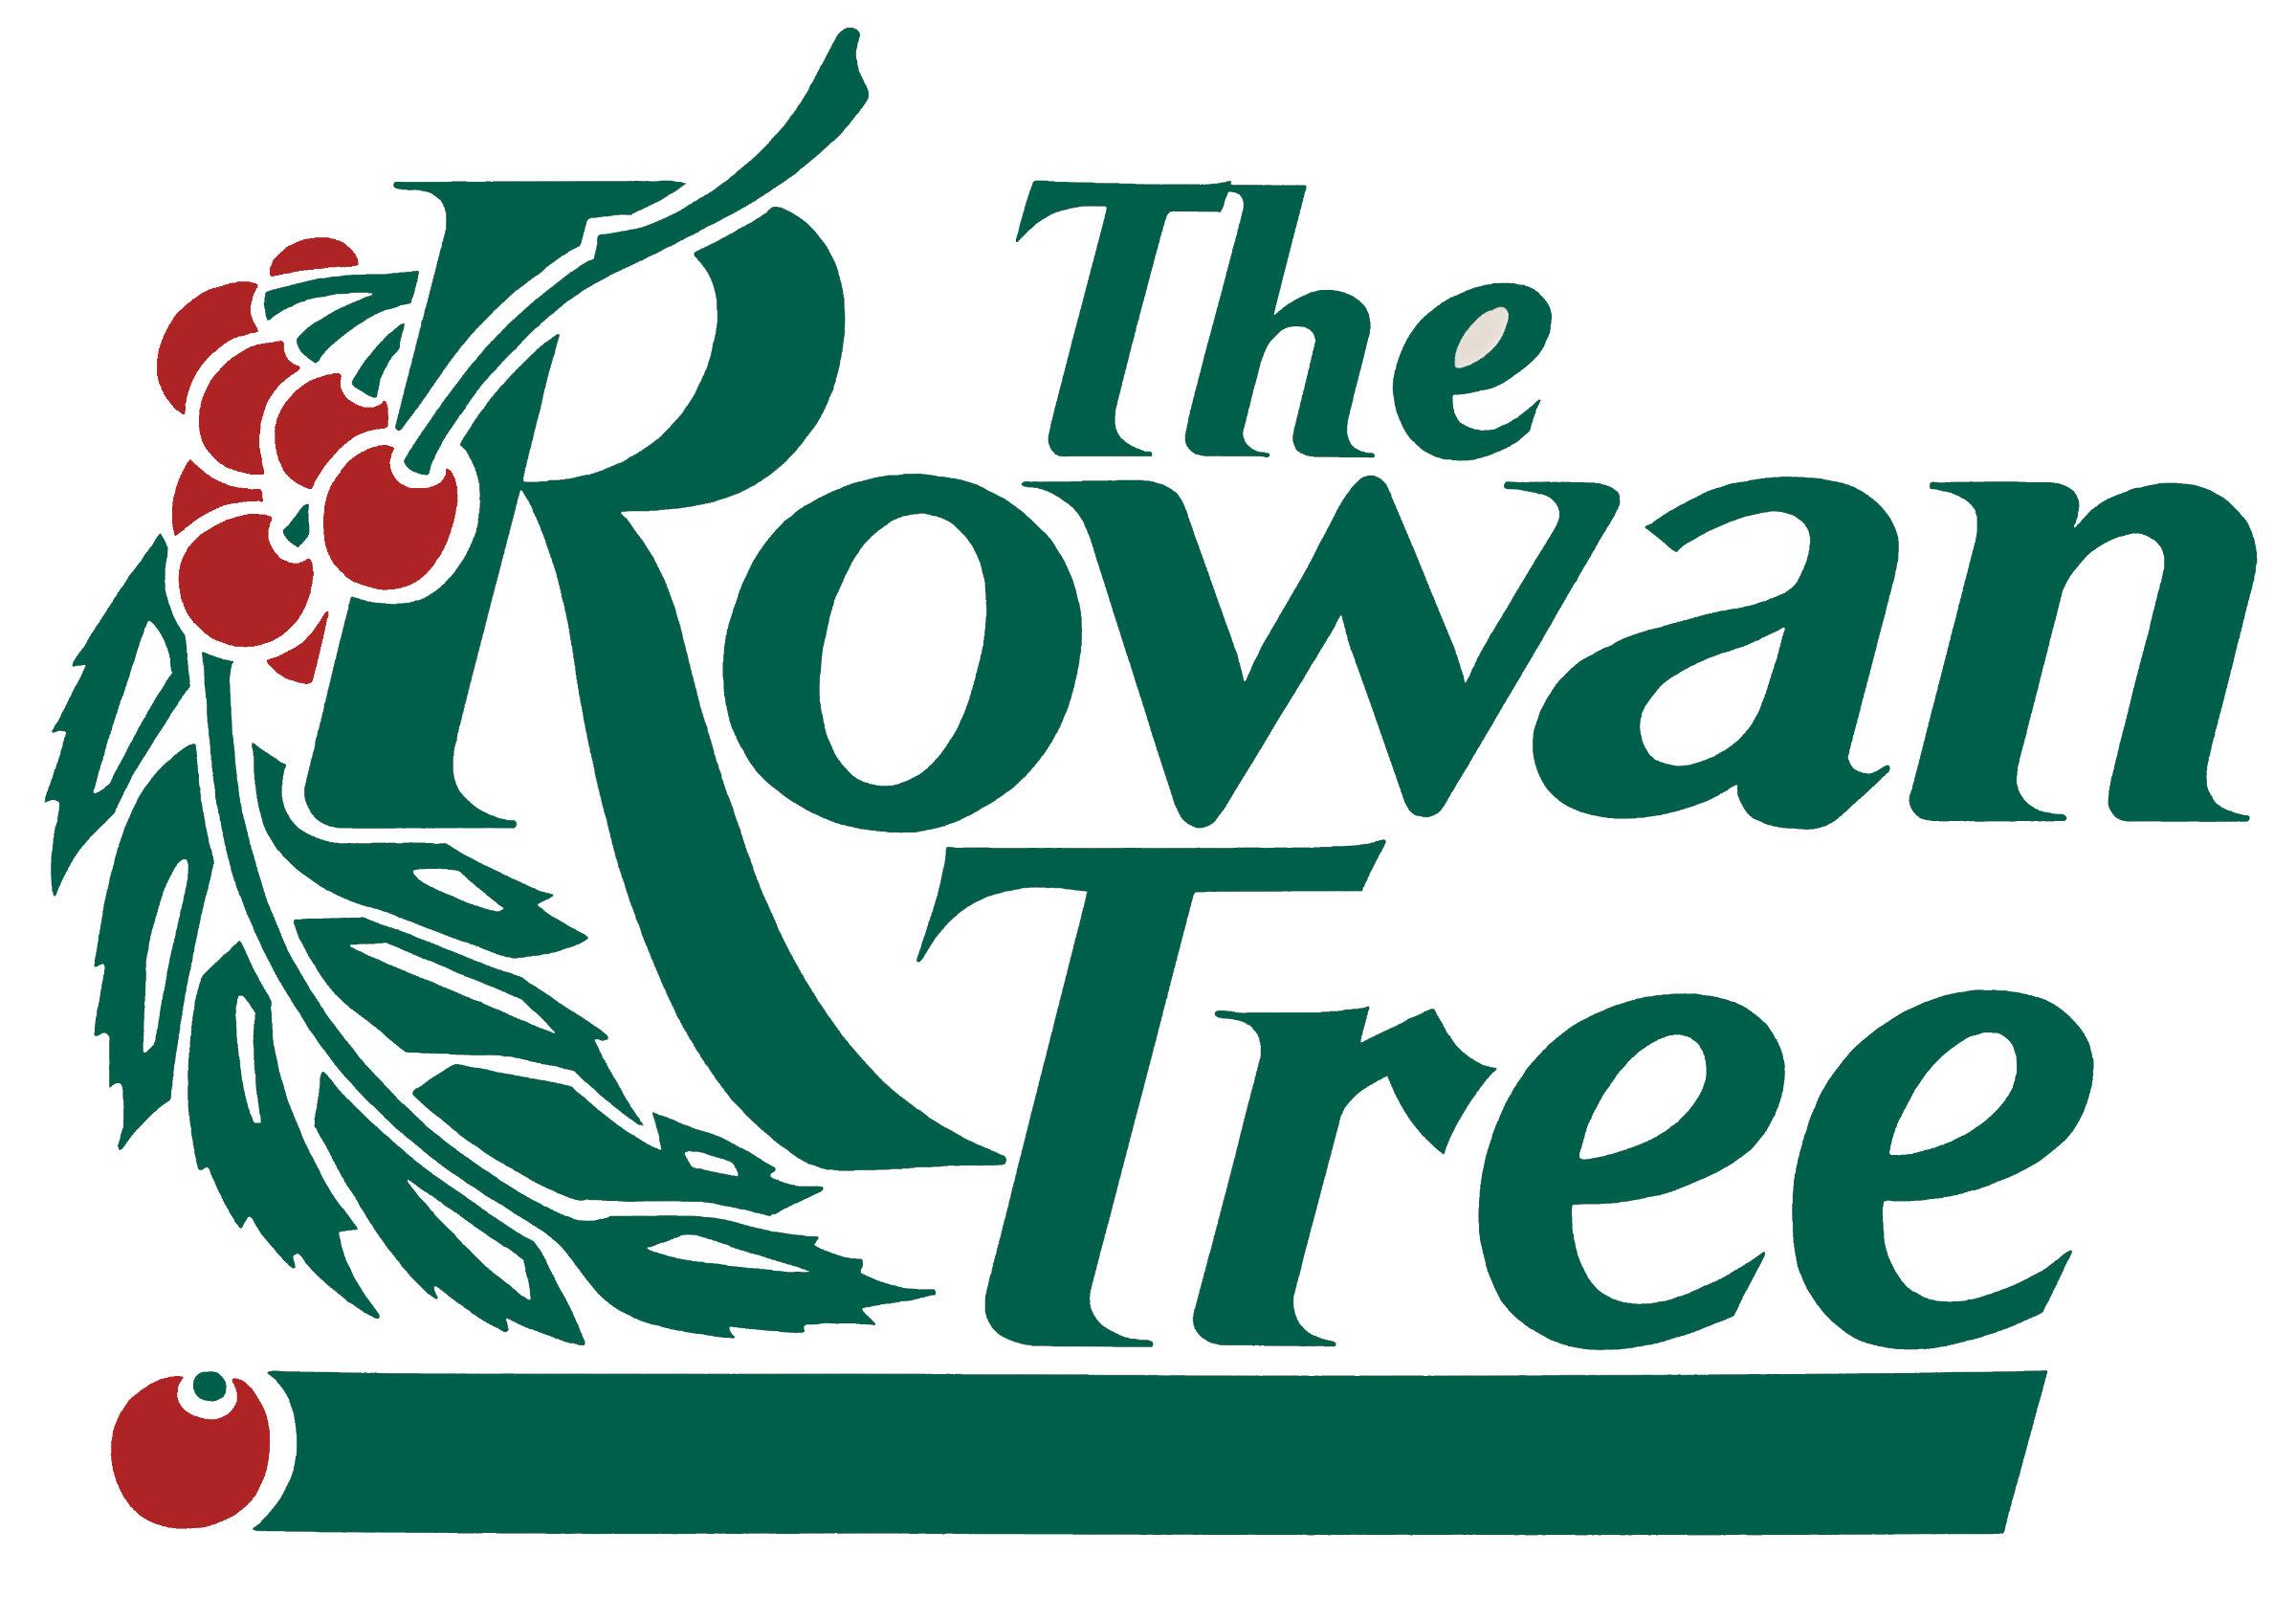 Rowan Tree logo.jpg